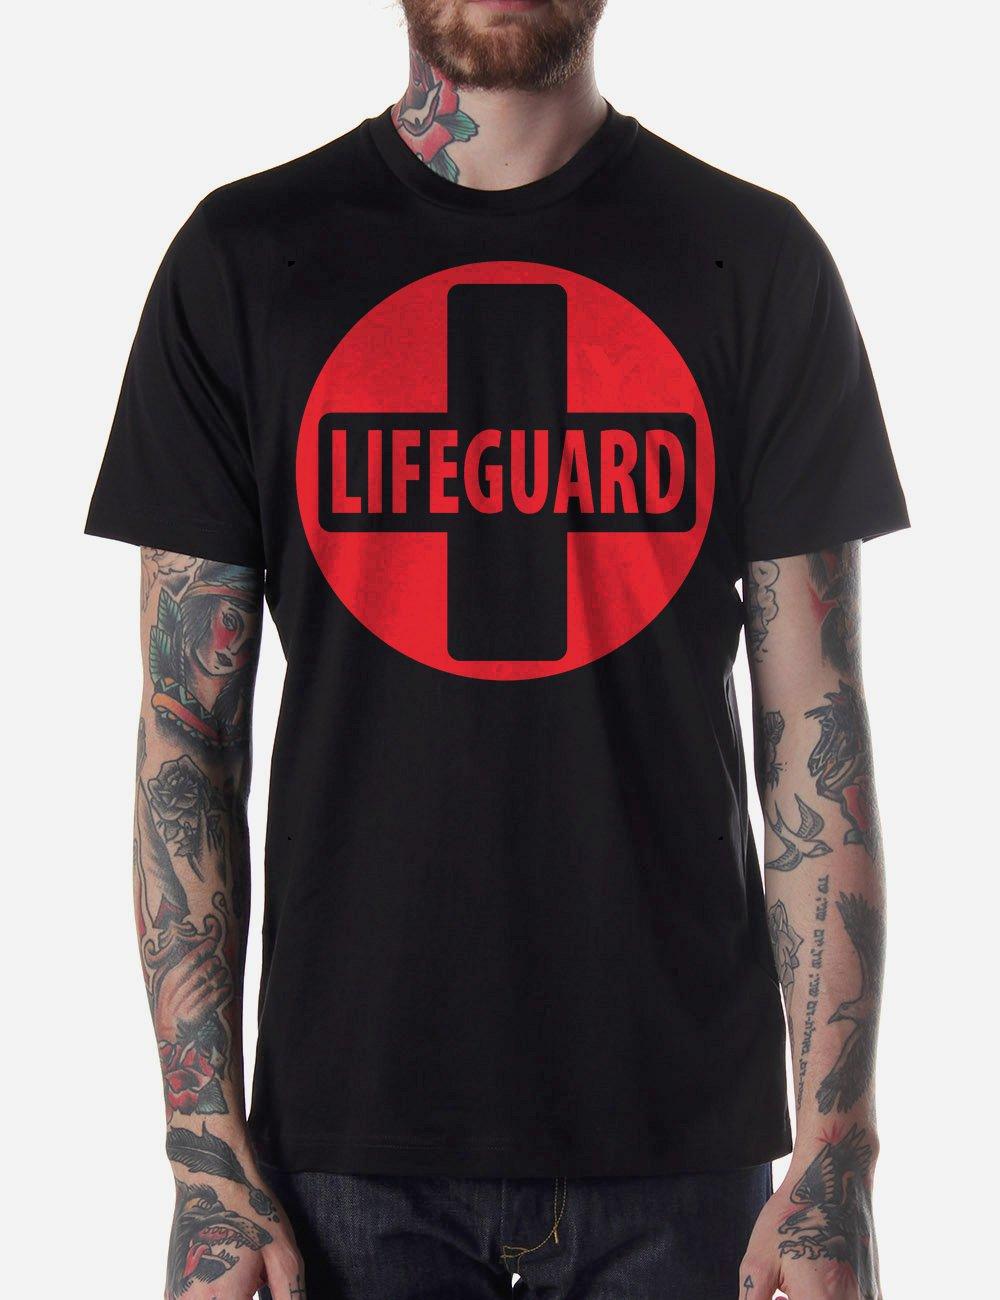 Black Men Tshirt Life Guard Design Black Tshirt For Men